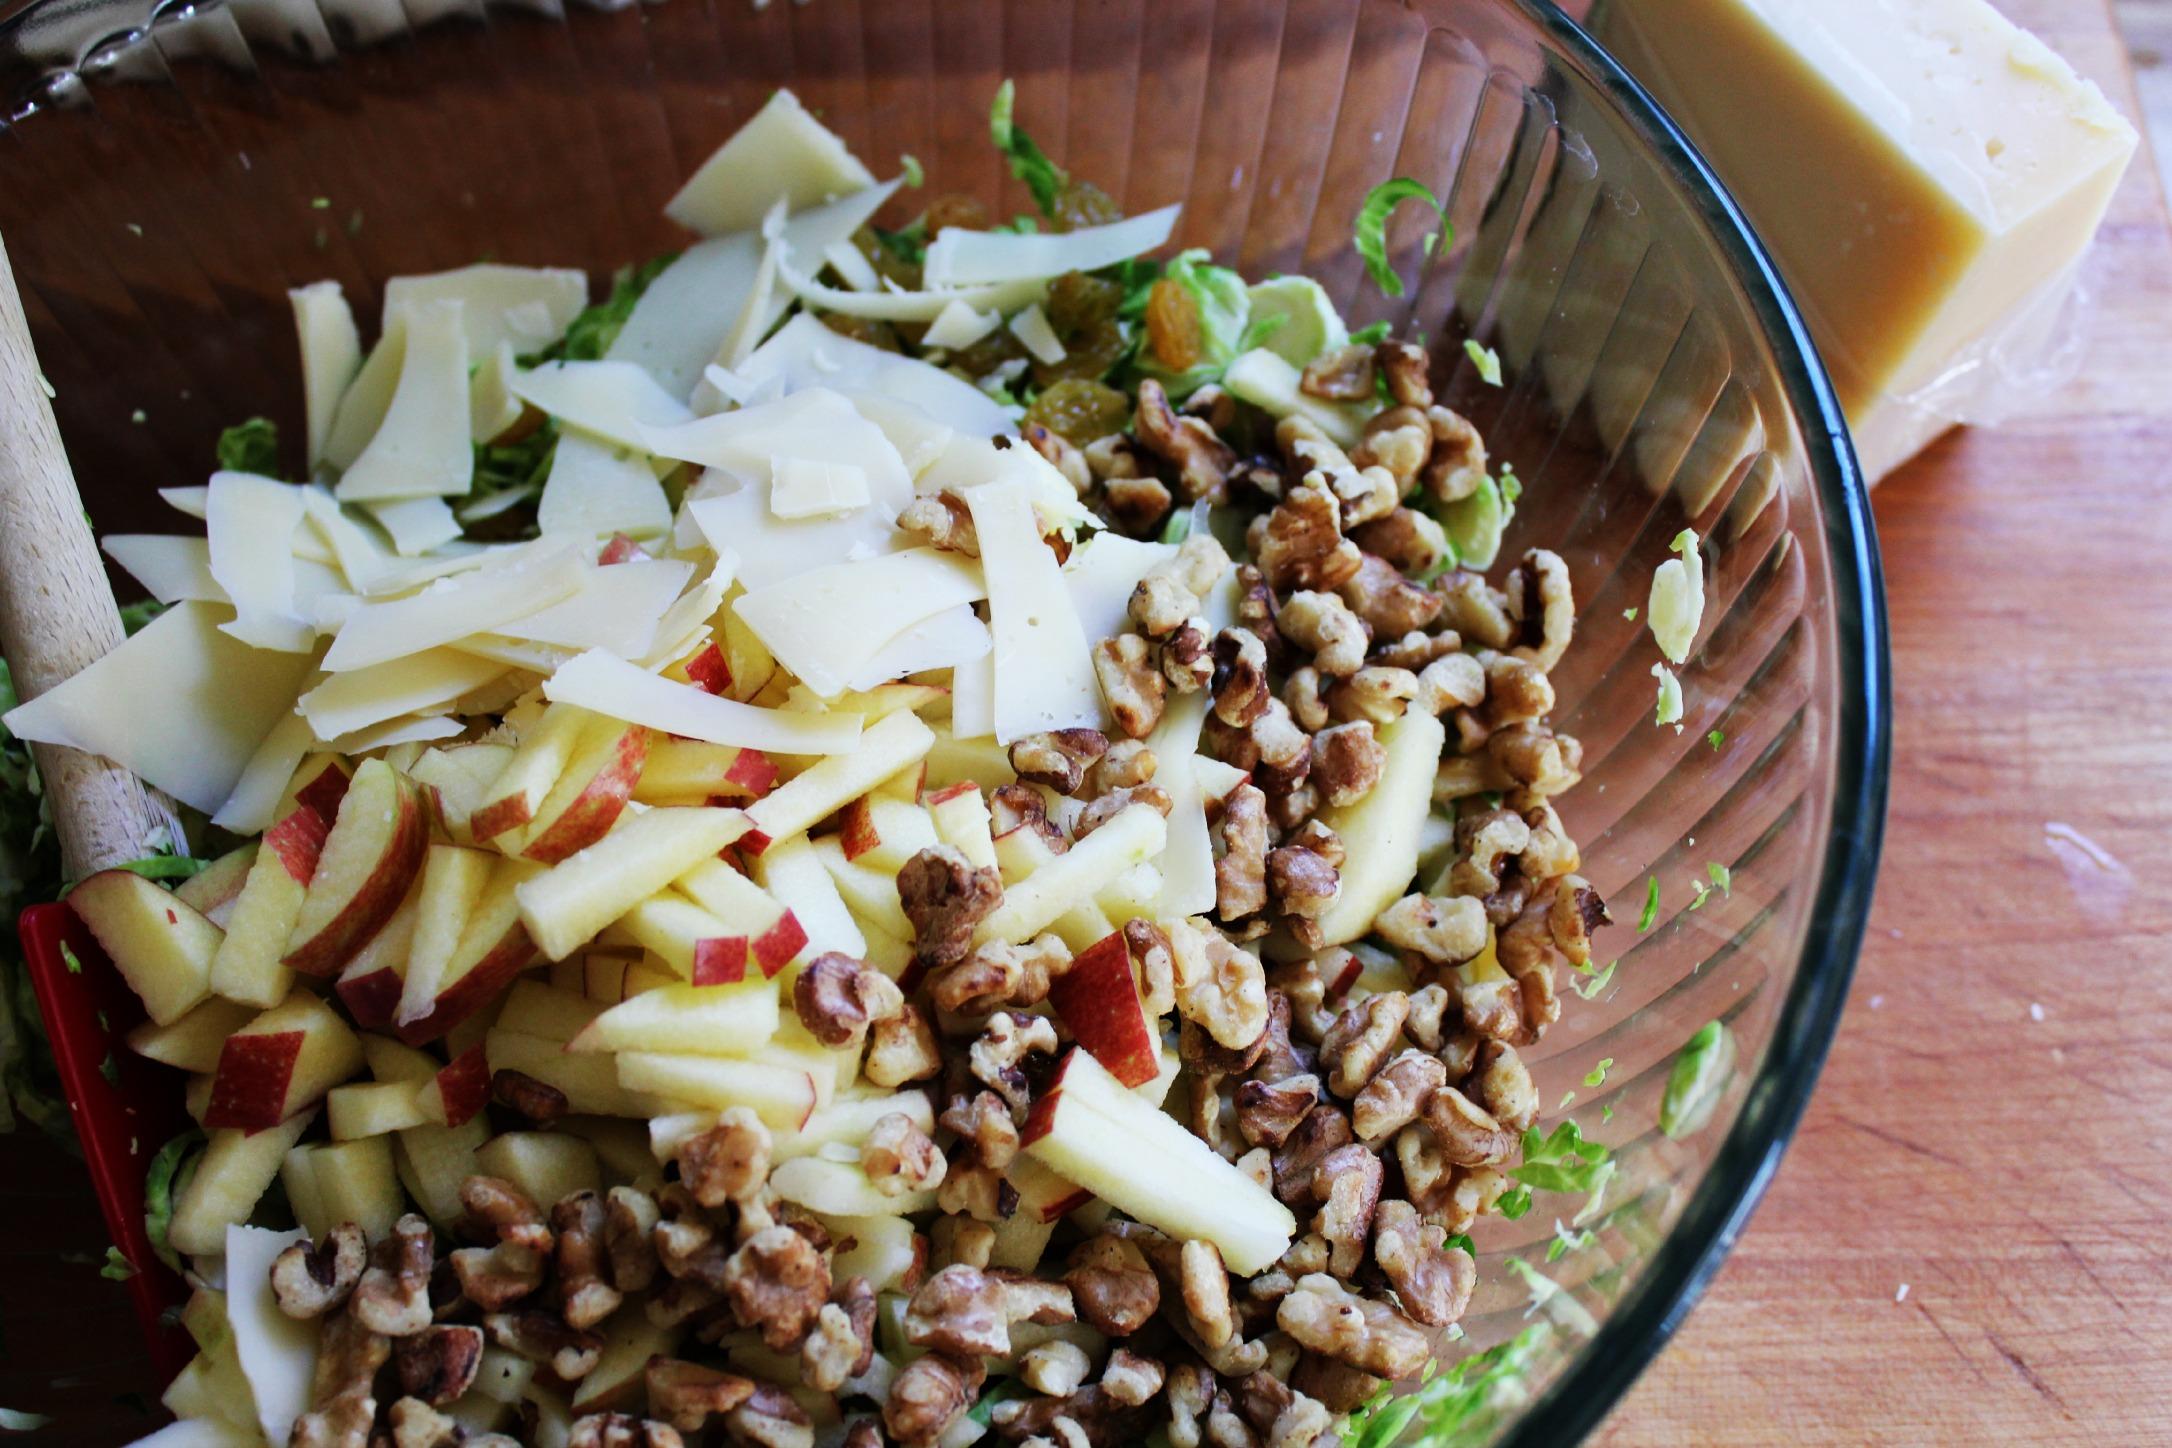 ... Salad with Apples, Golden Raisins, Walnuts & Parmesan | The Sea Salt